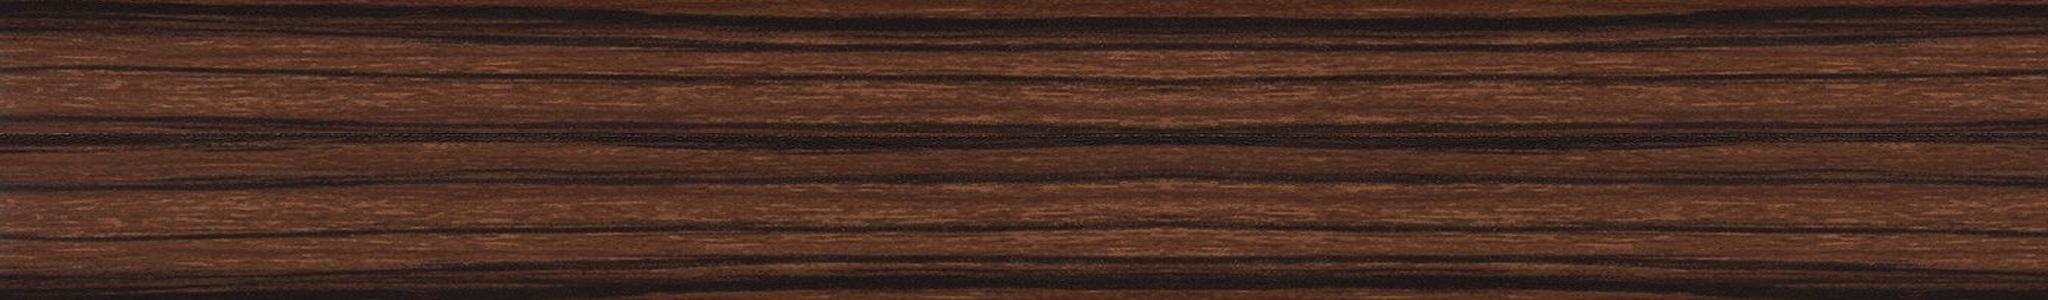 HD 28167 ABS hrana oliva tmavá perla